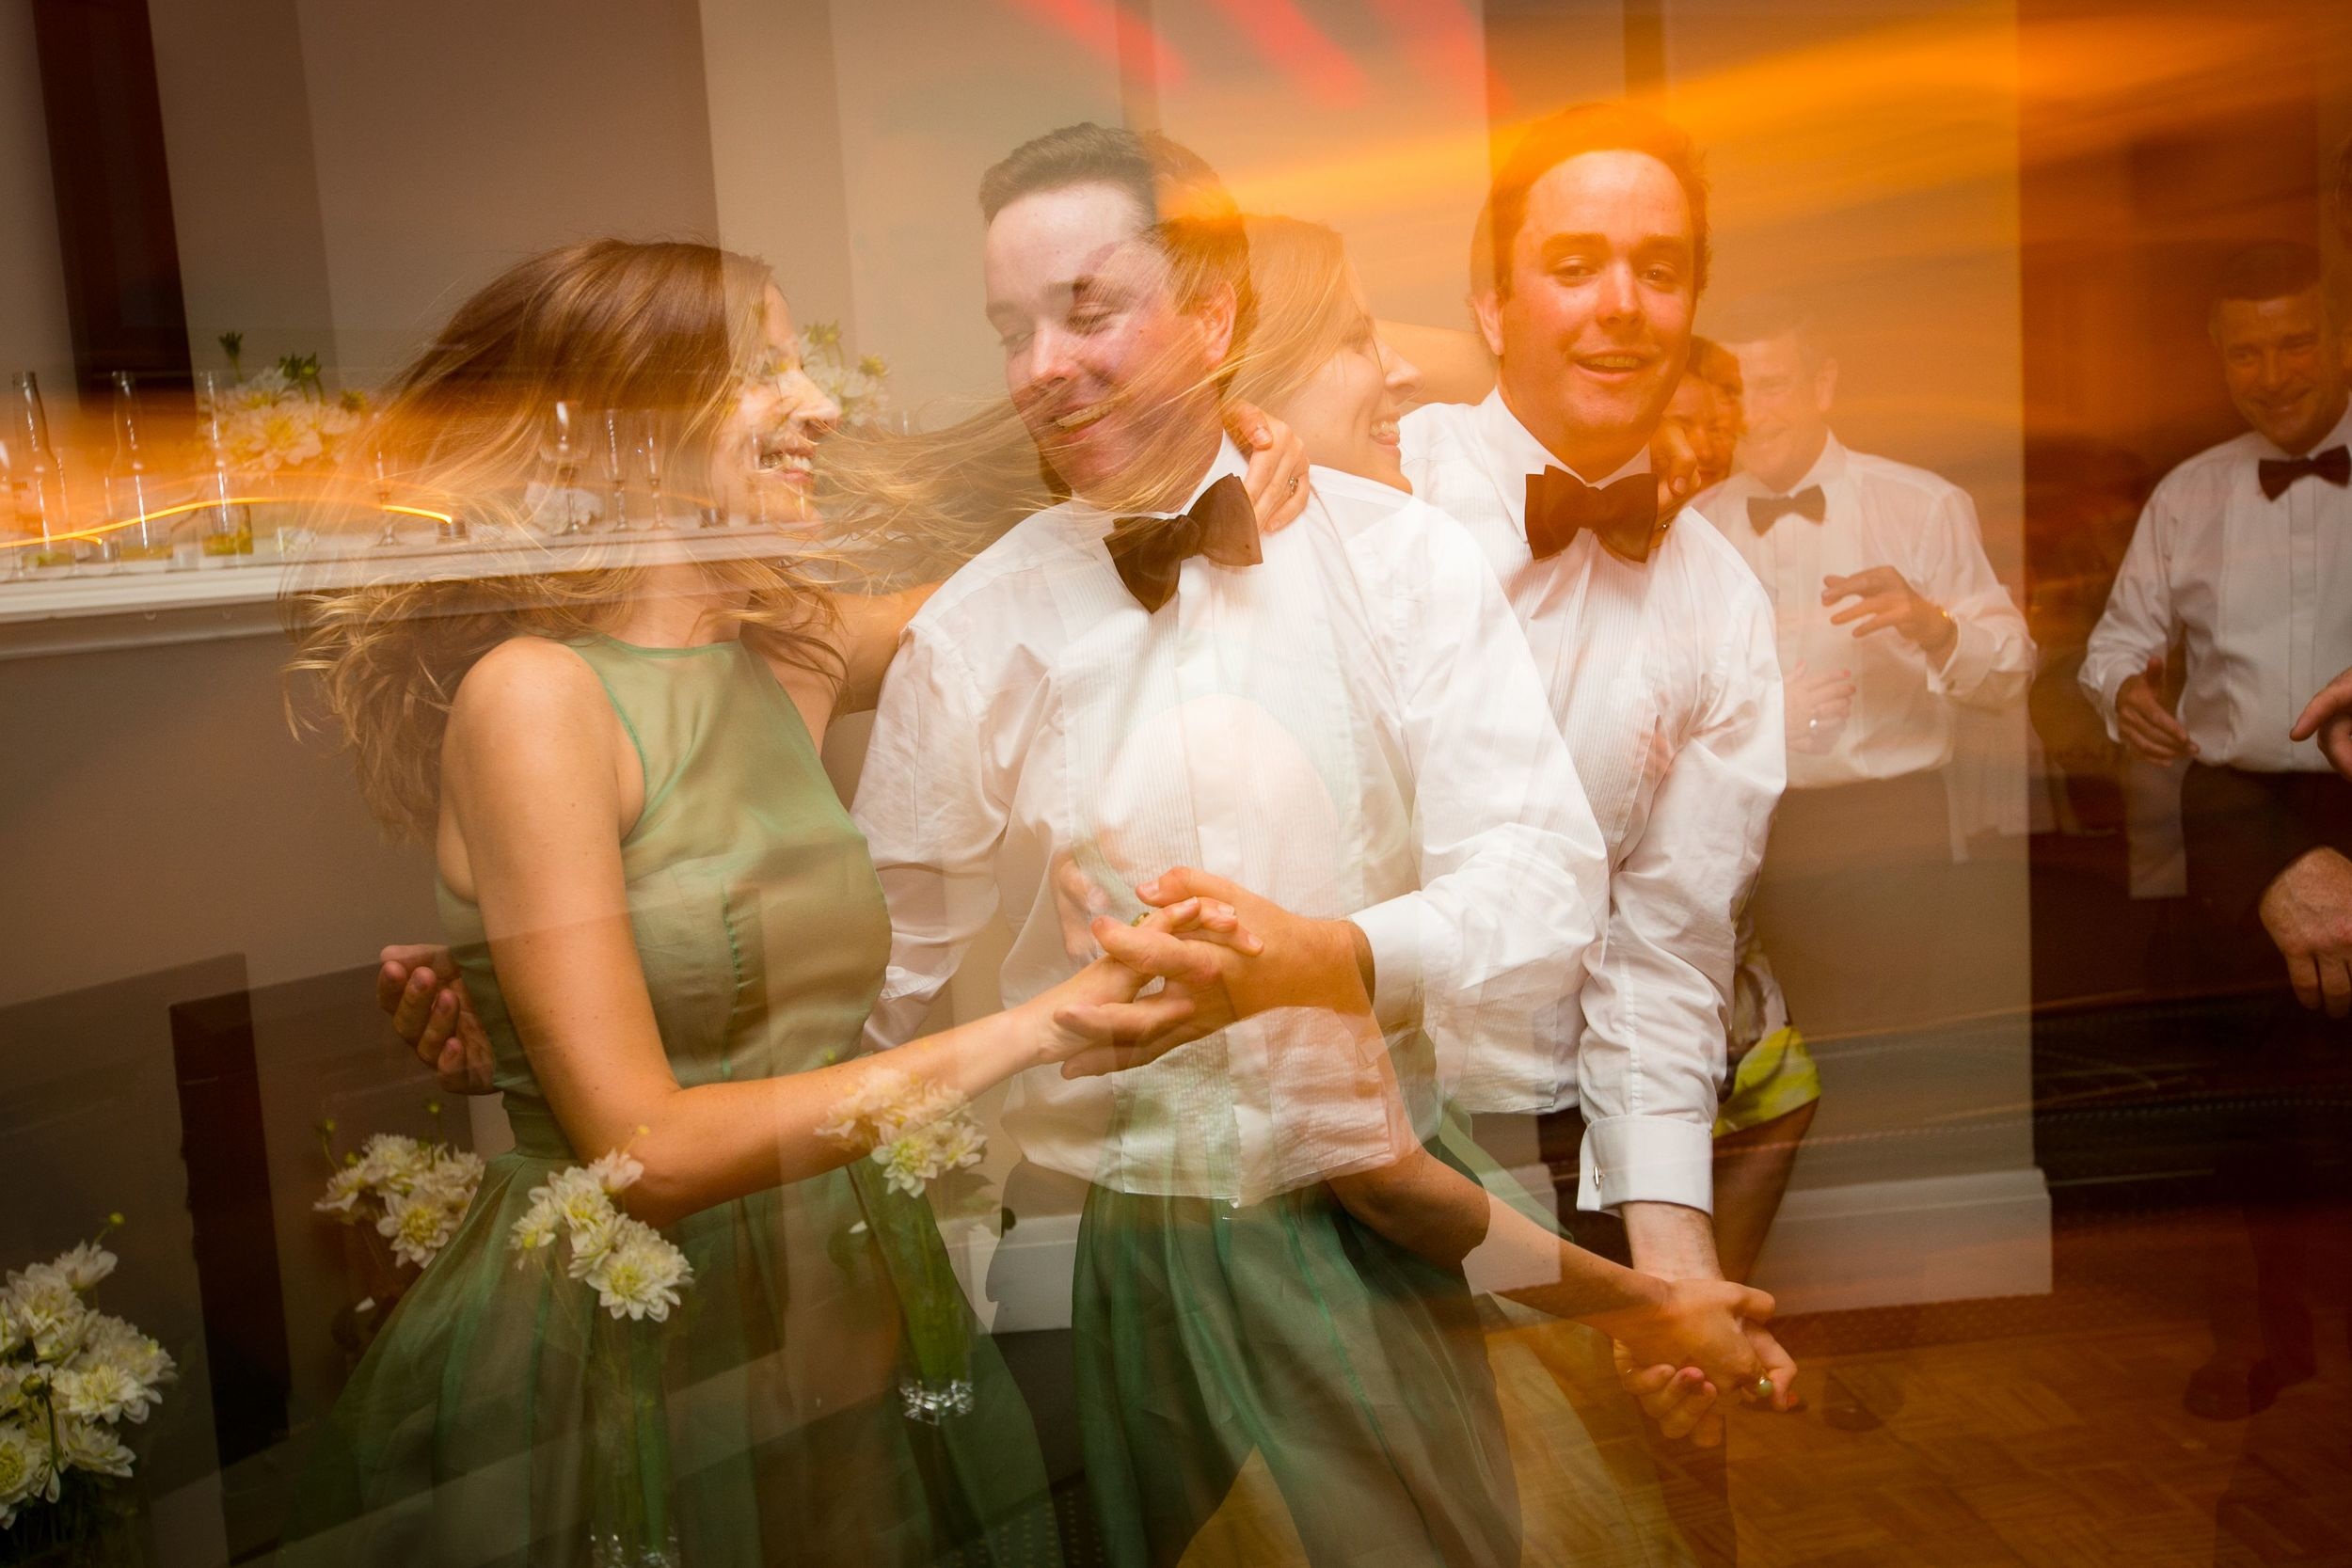 Beth and James wedding reception Watsons Bay Hotel Sydney Dancing